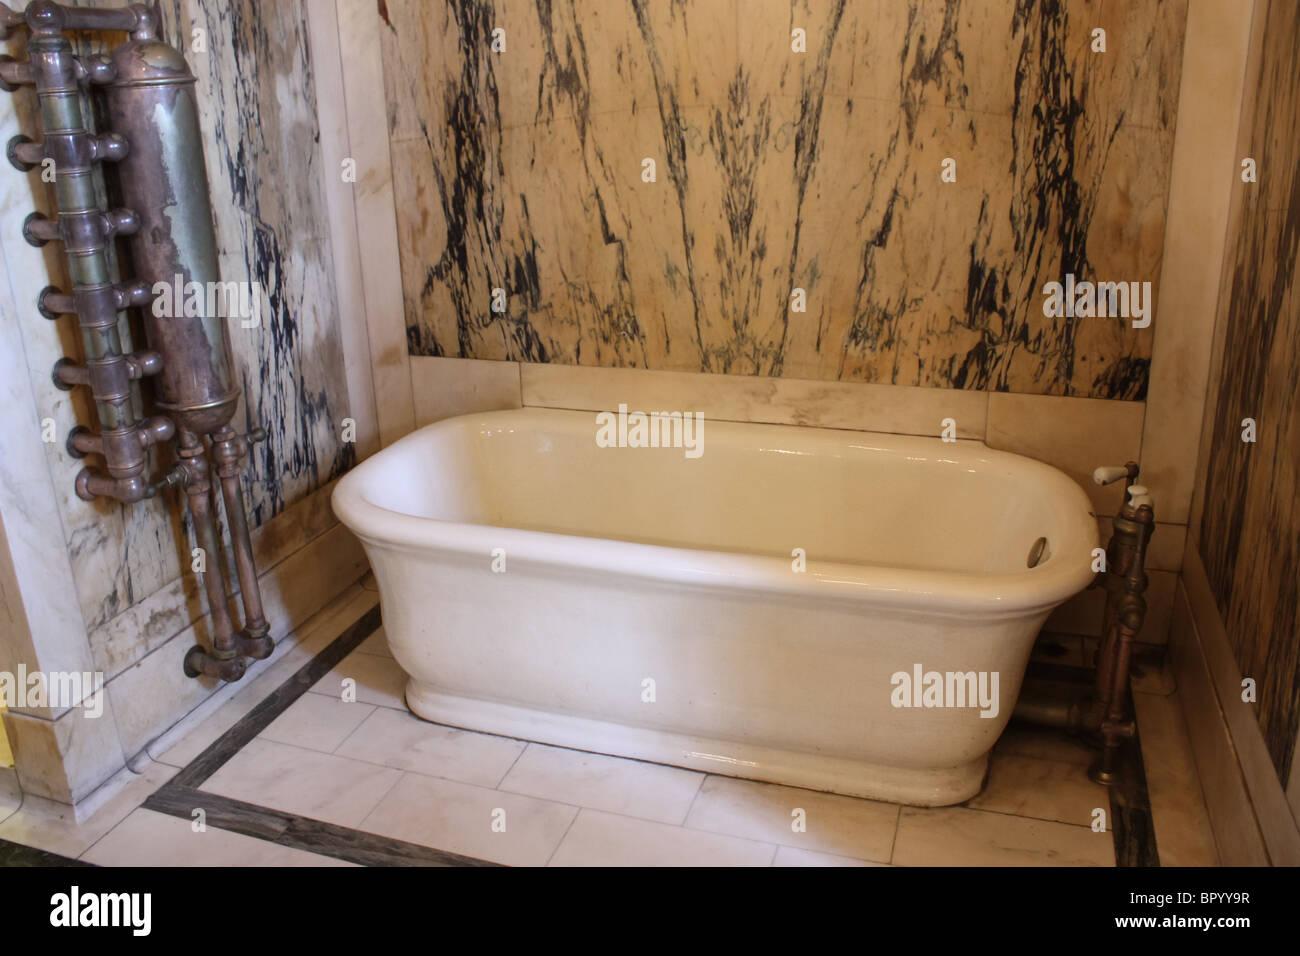 Vasca Da Bagno Piccola Vintage : Vasca da bagno retro vasche da bagno retrò belle e intramontabili